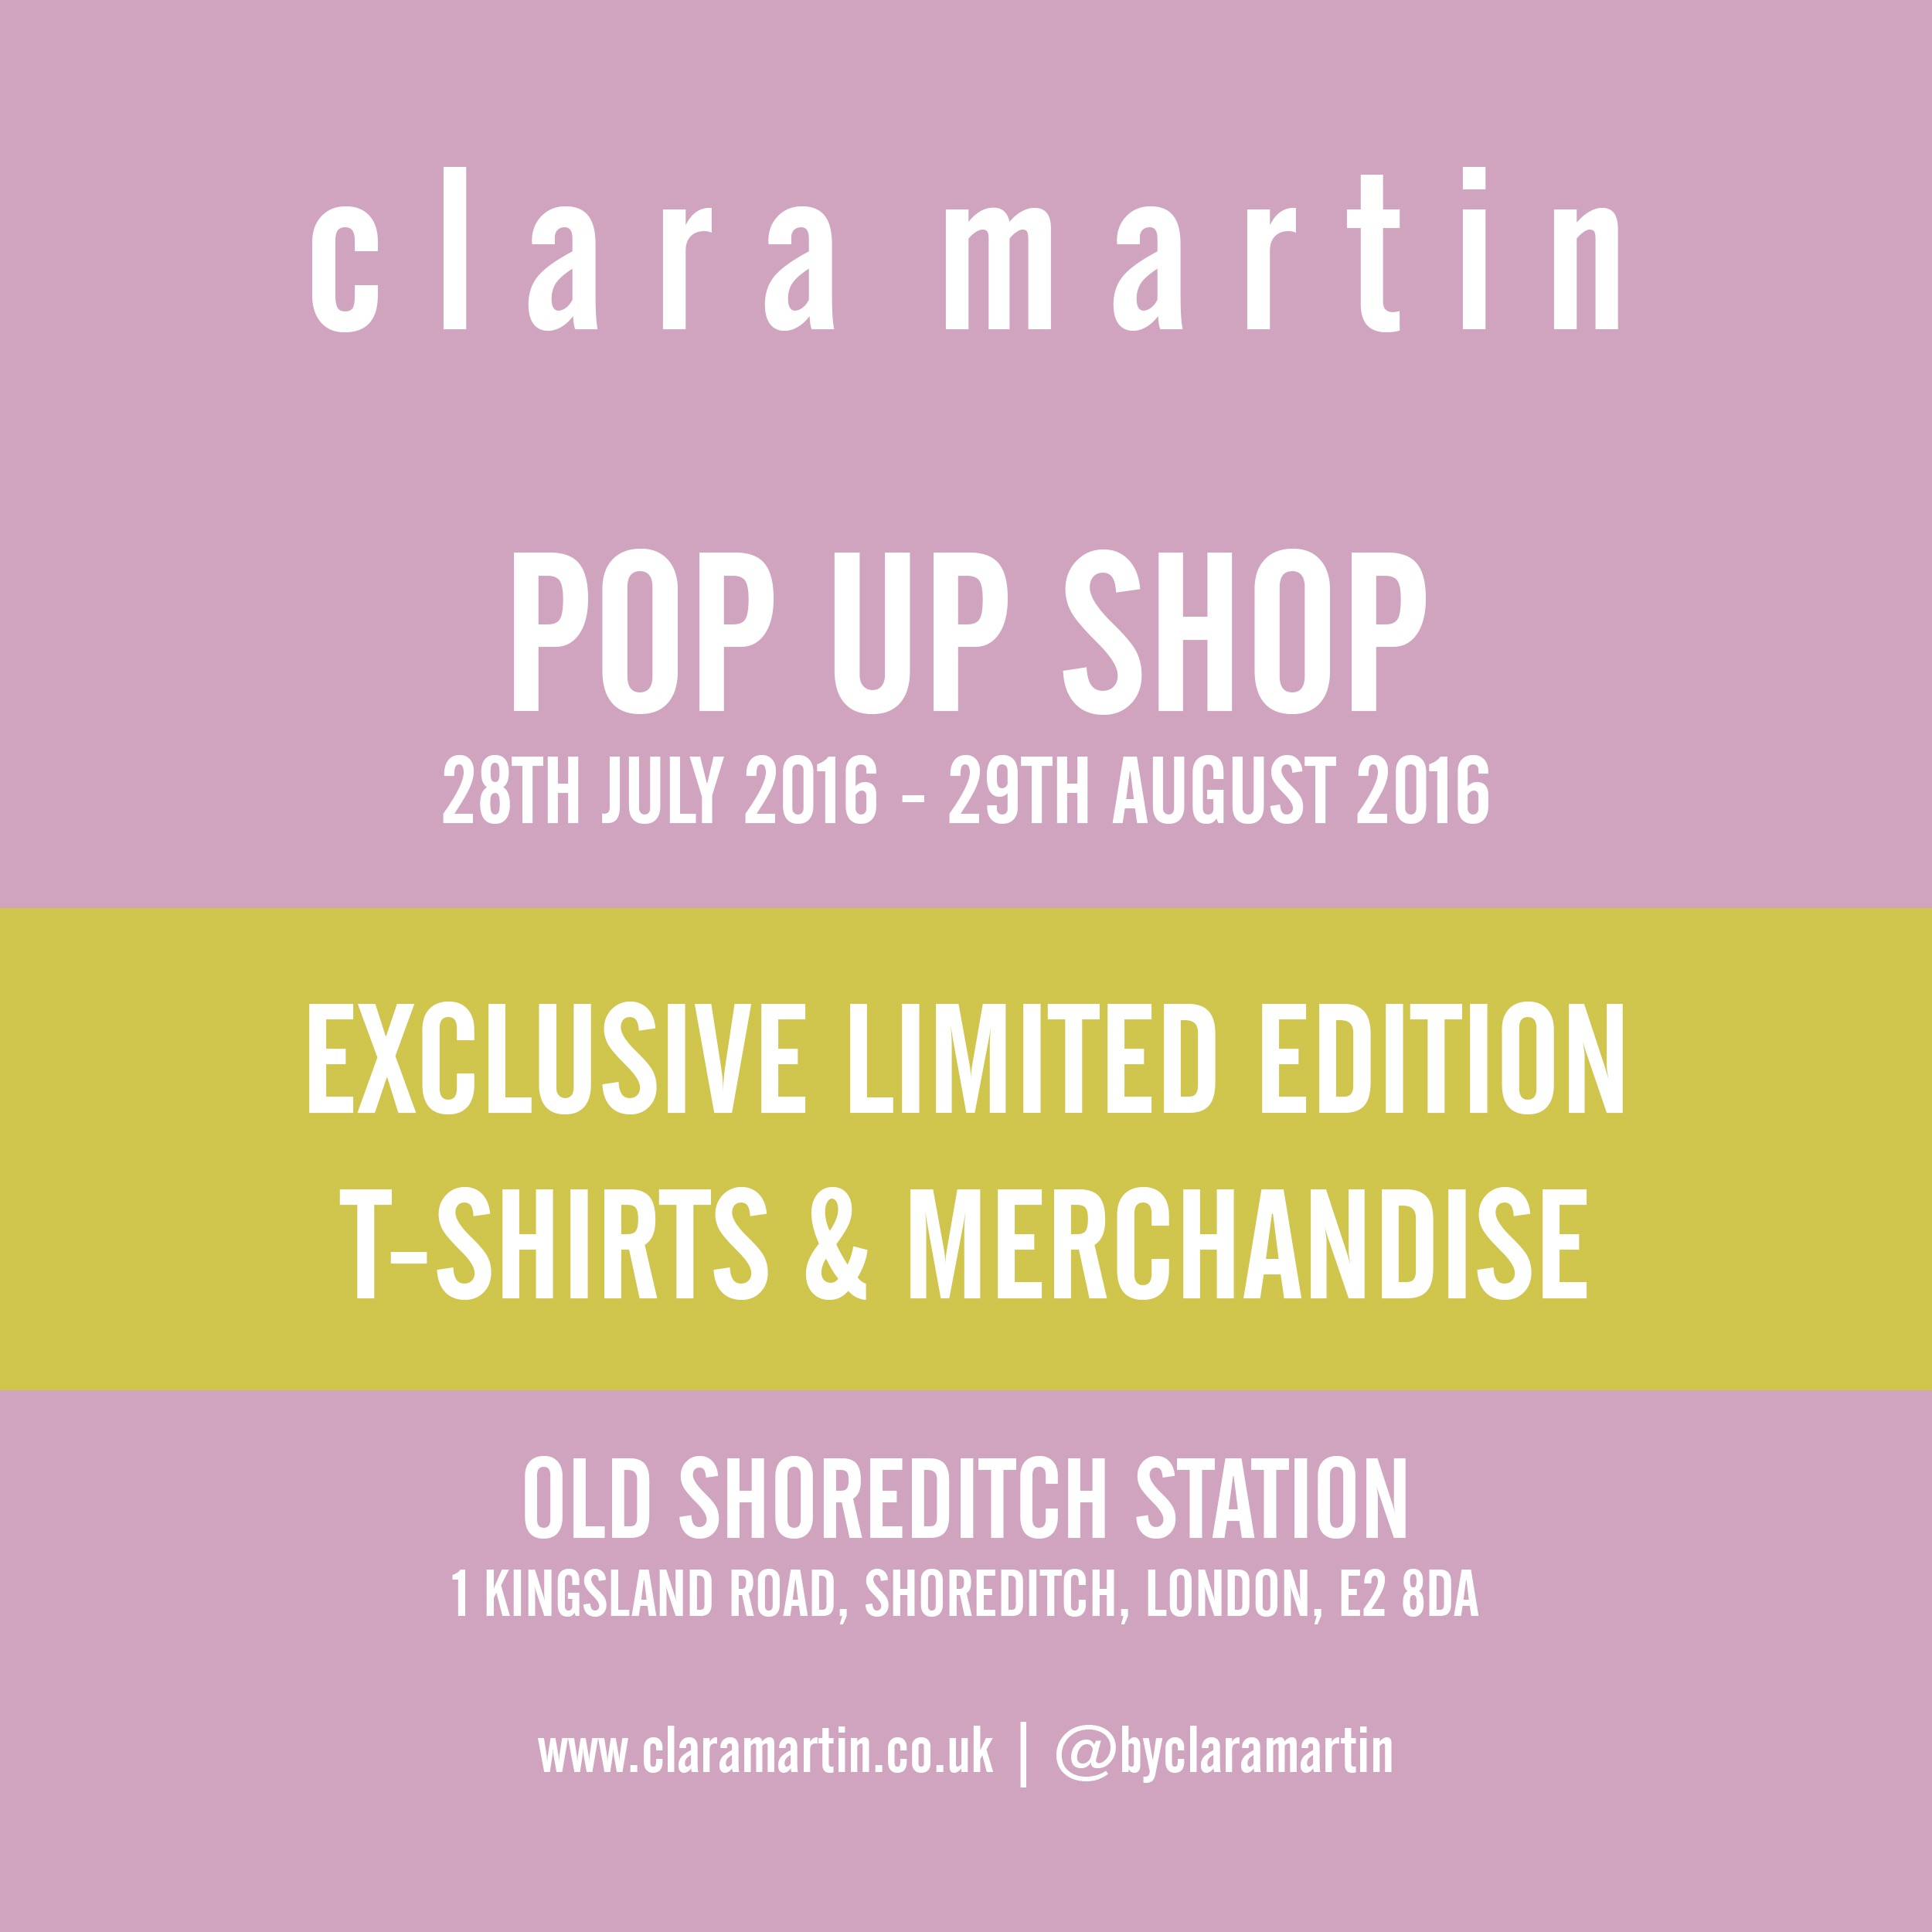 clara-martin-pop-up-invite-2016